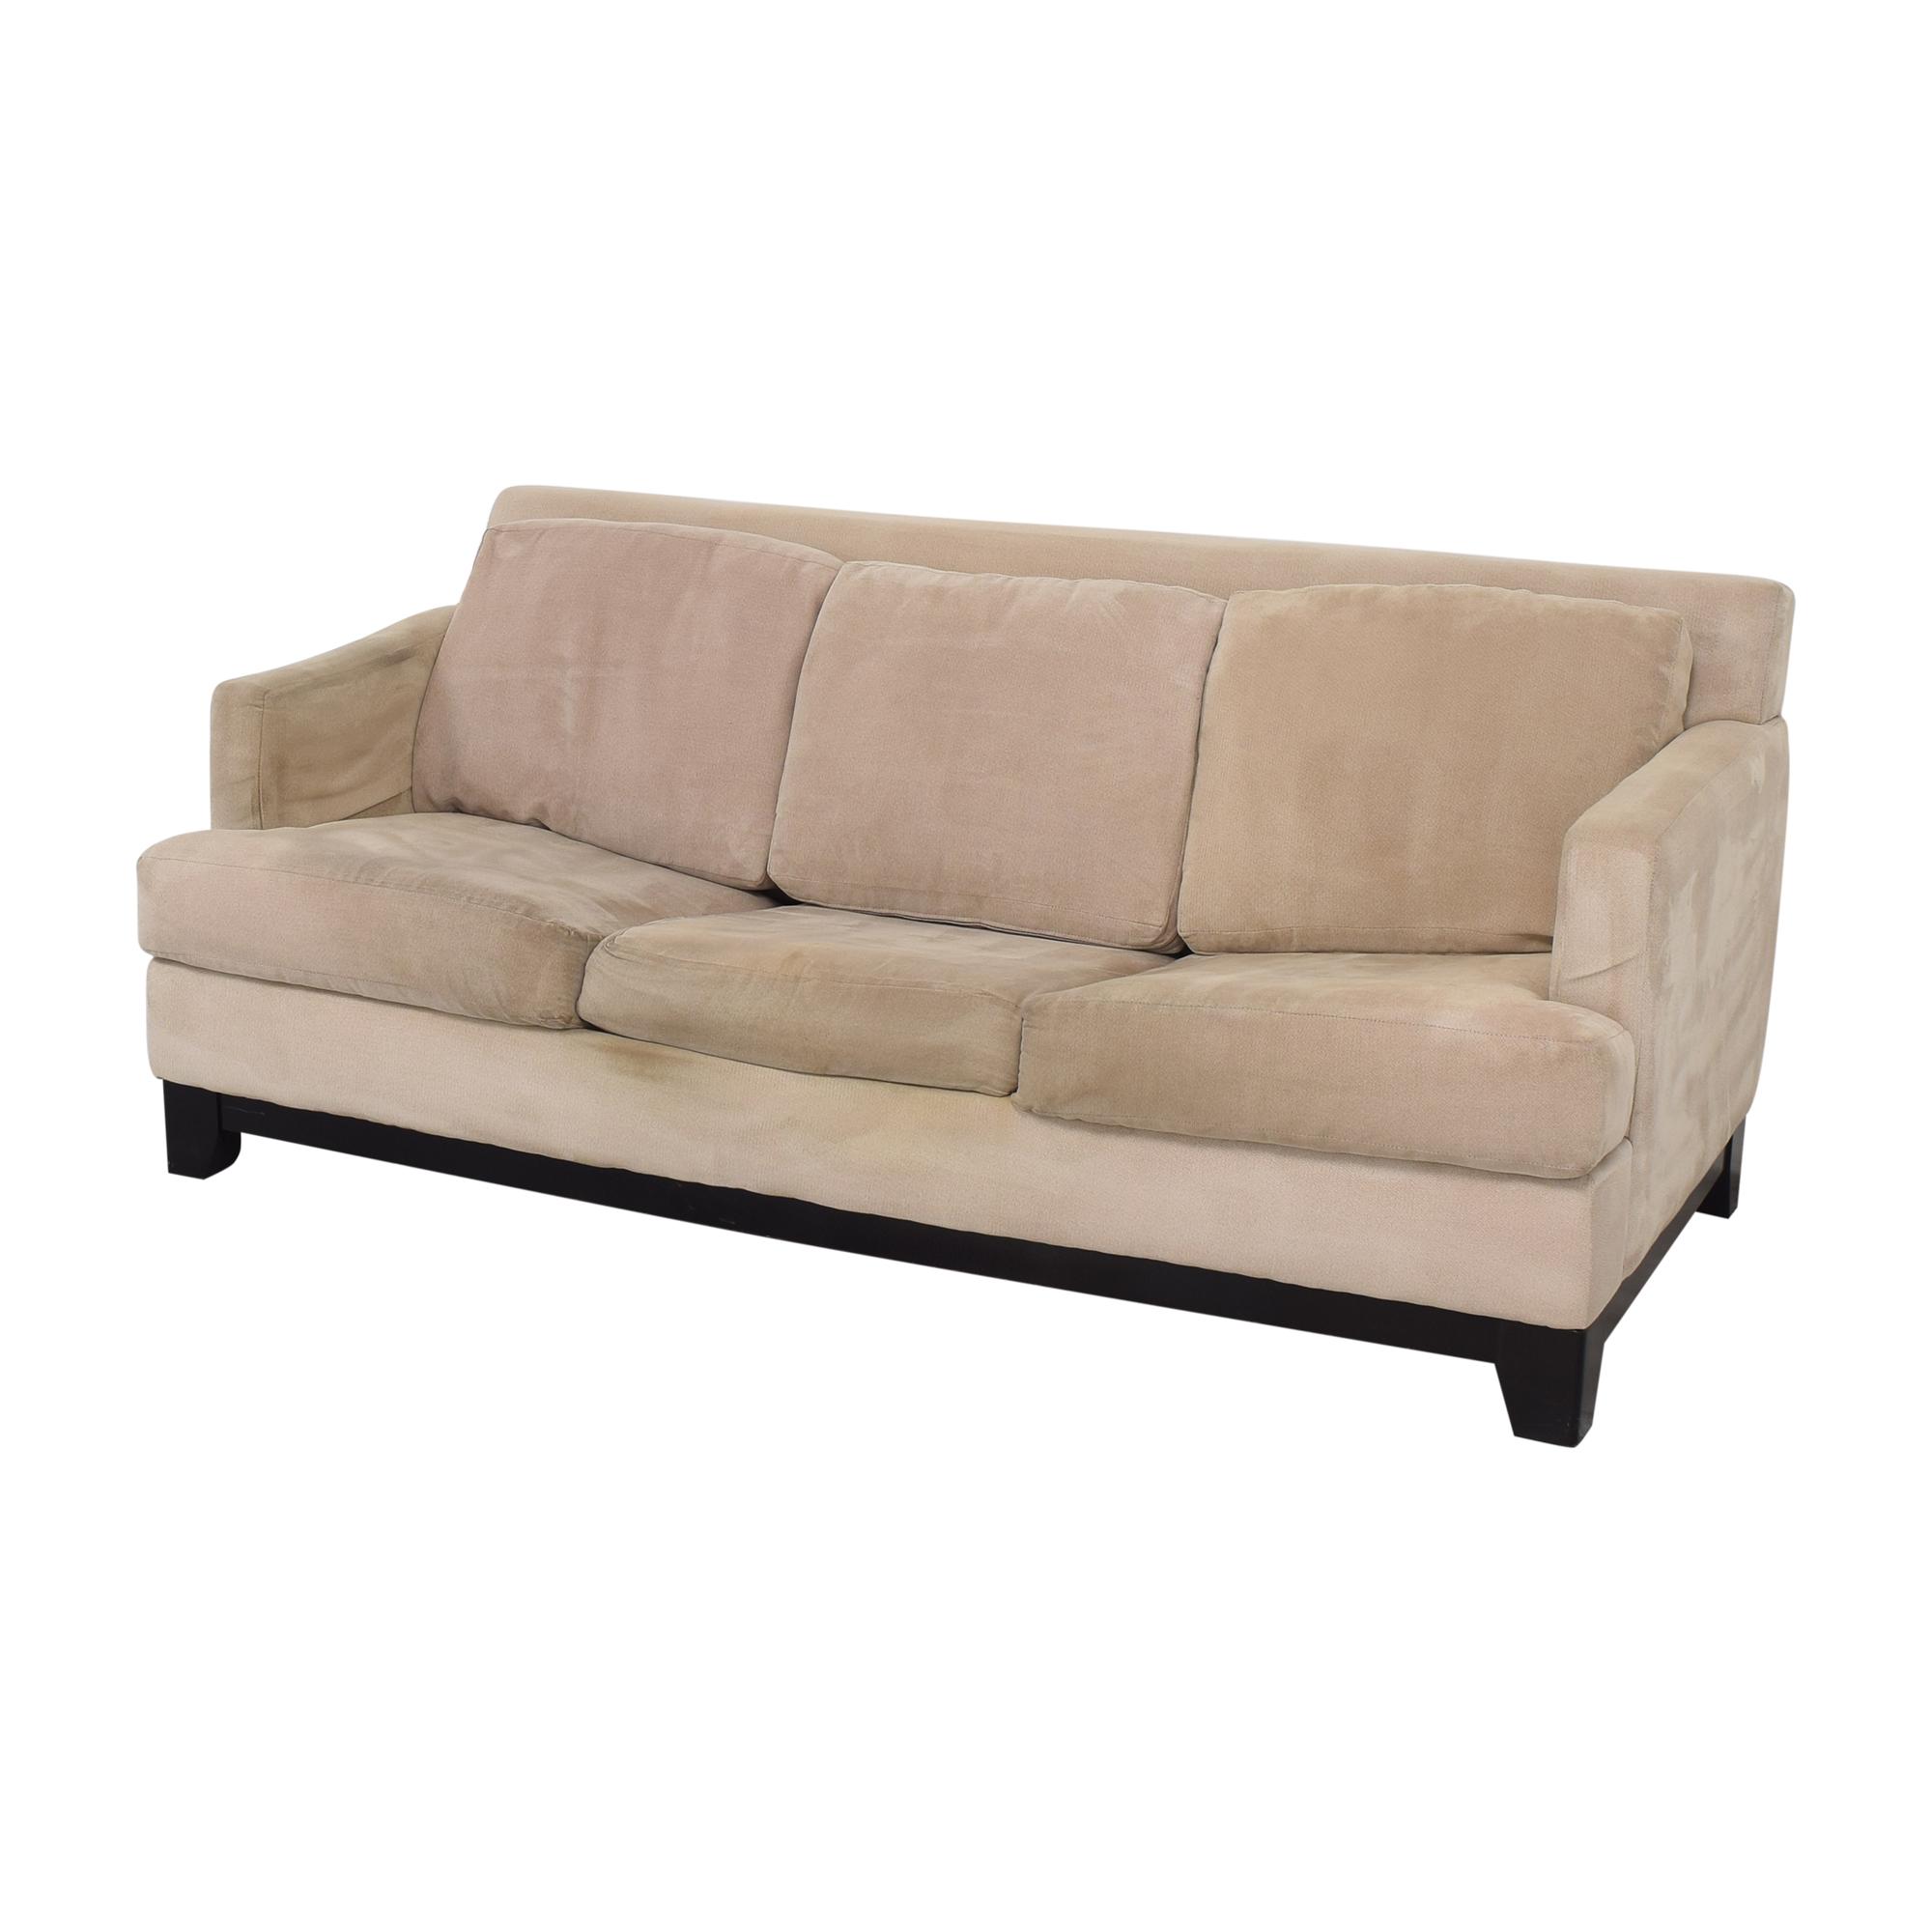 shop Macy's Sleeper Sofa Macy's